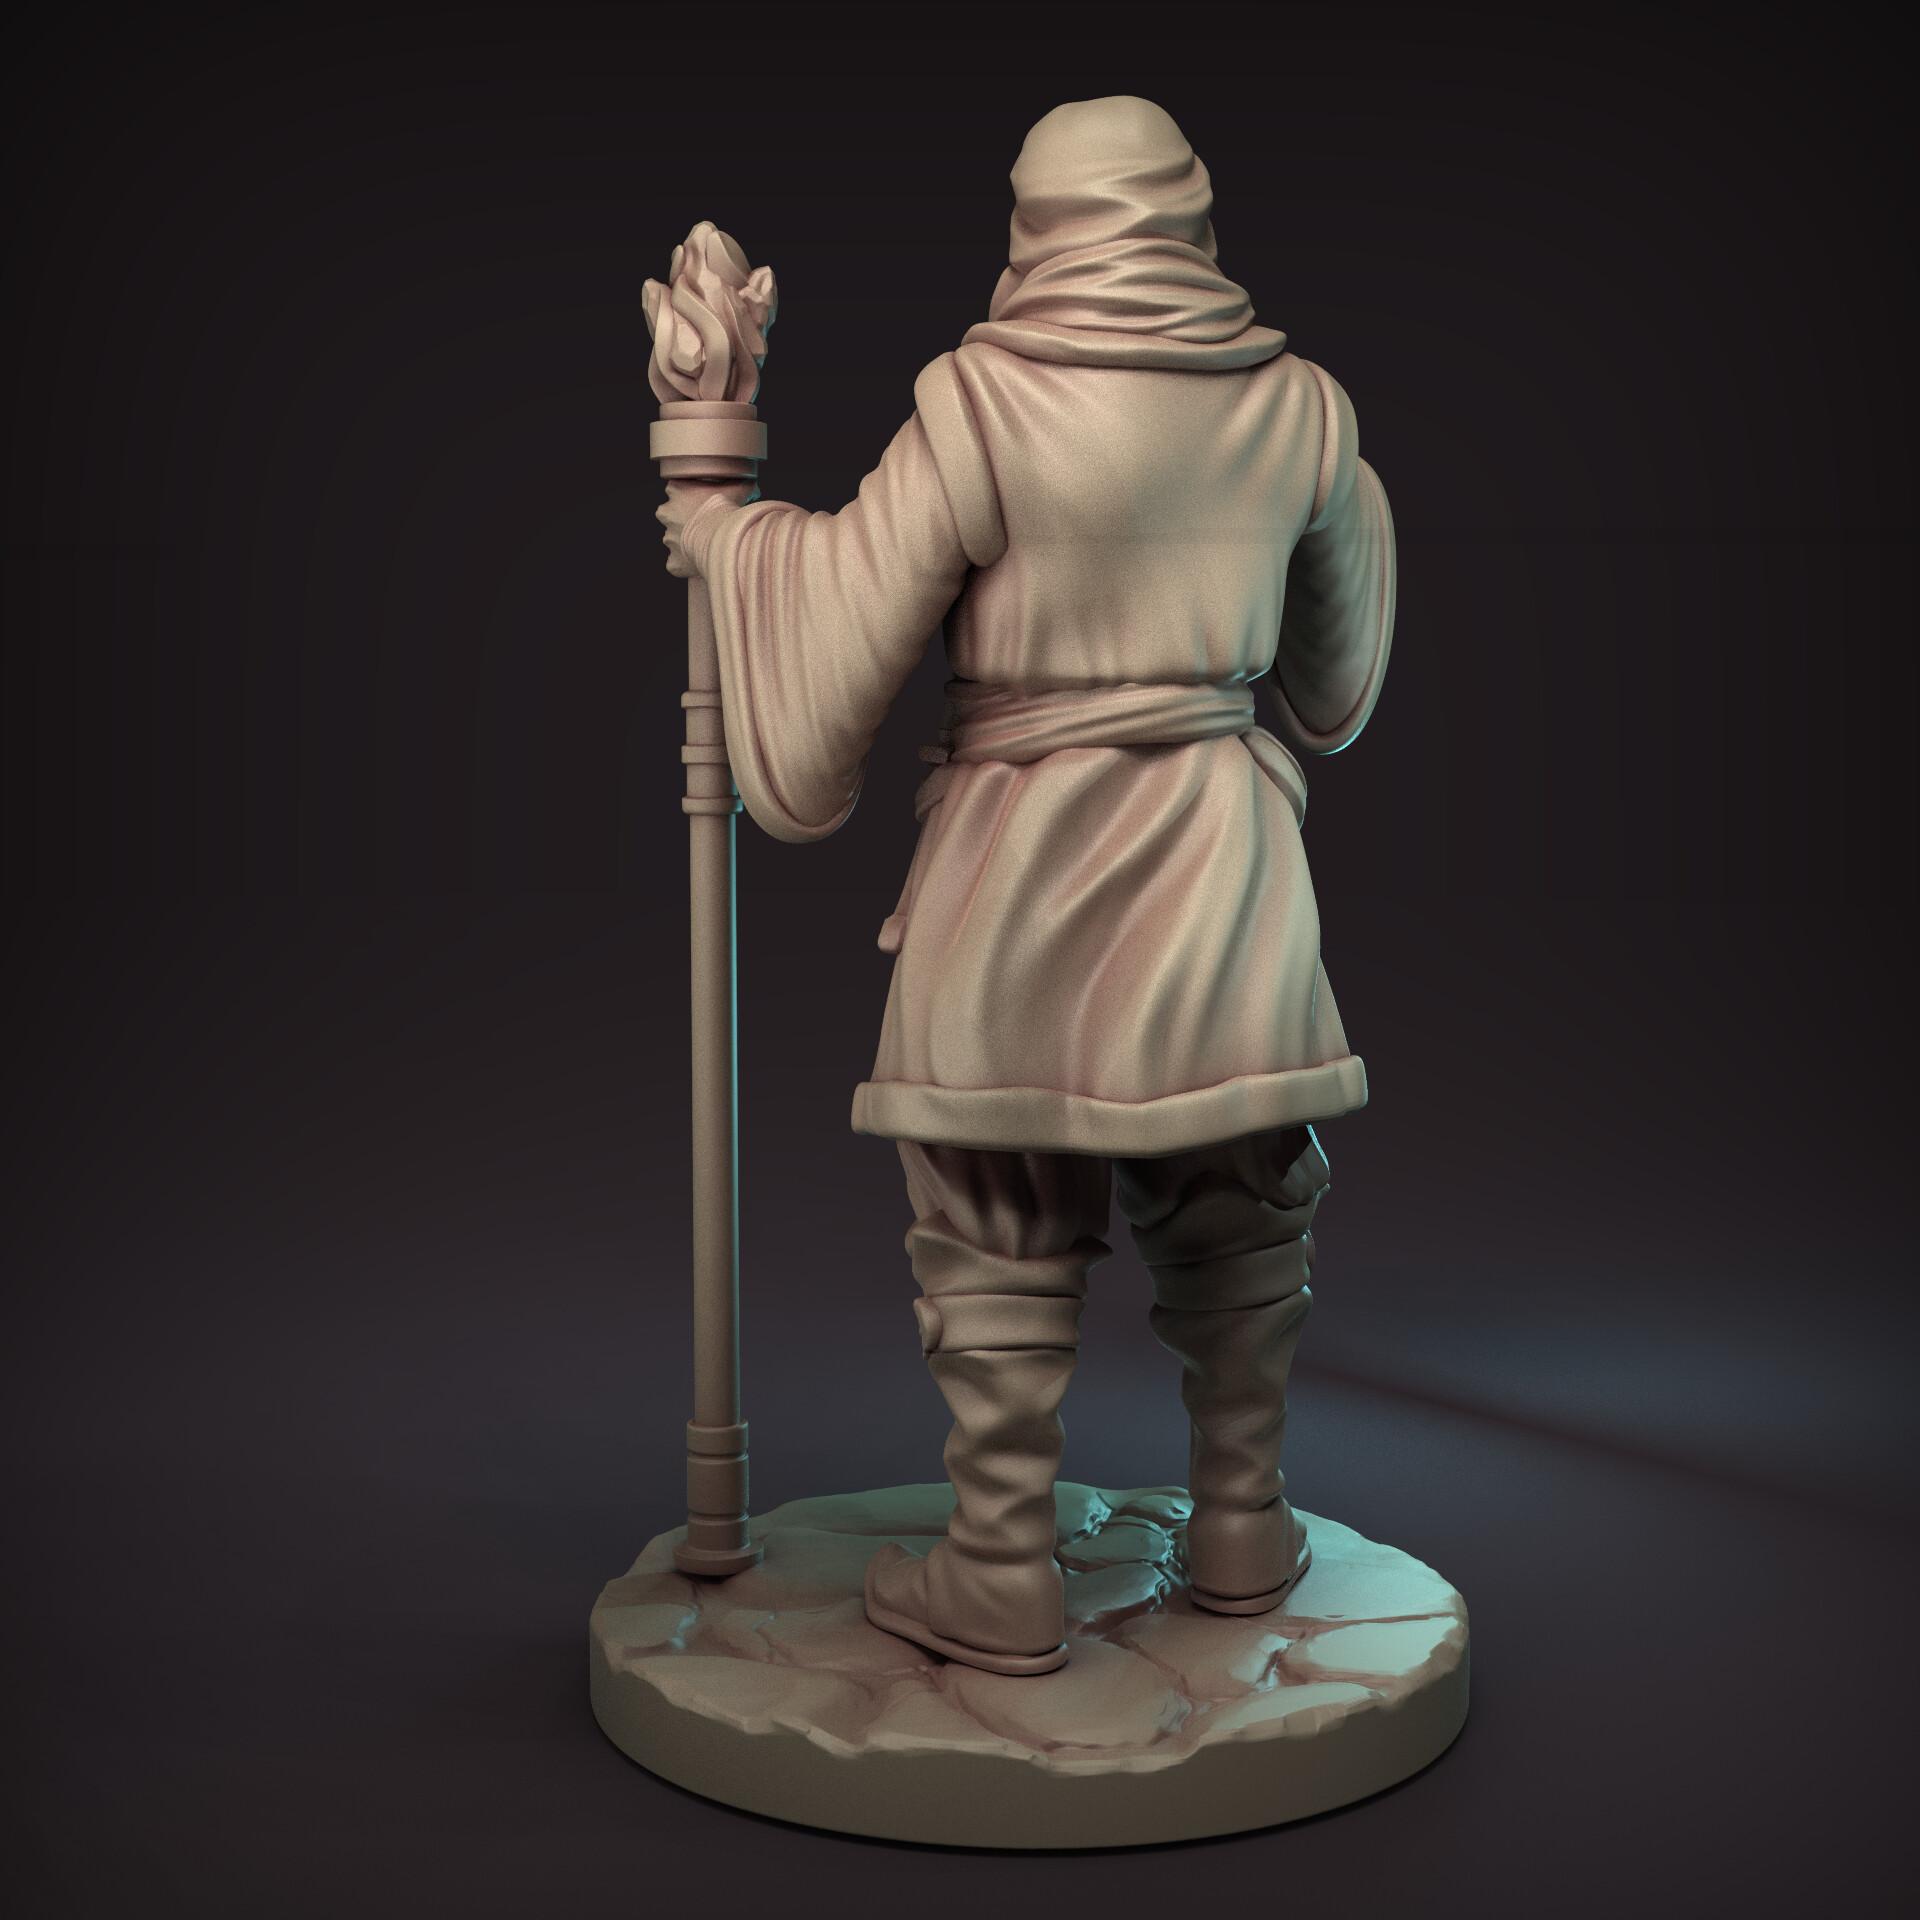 Artem bespalov ice wizard01 107